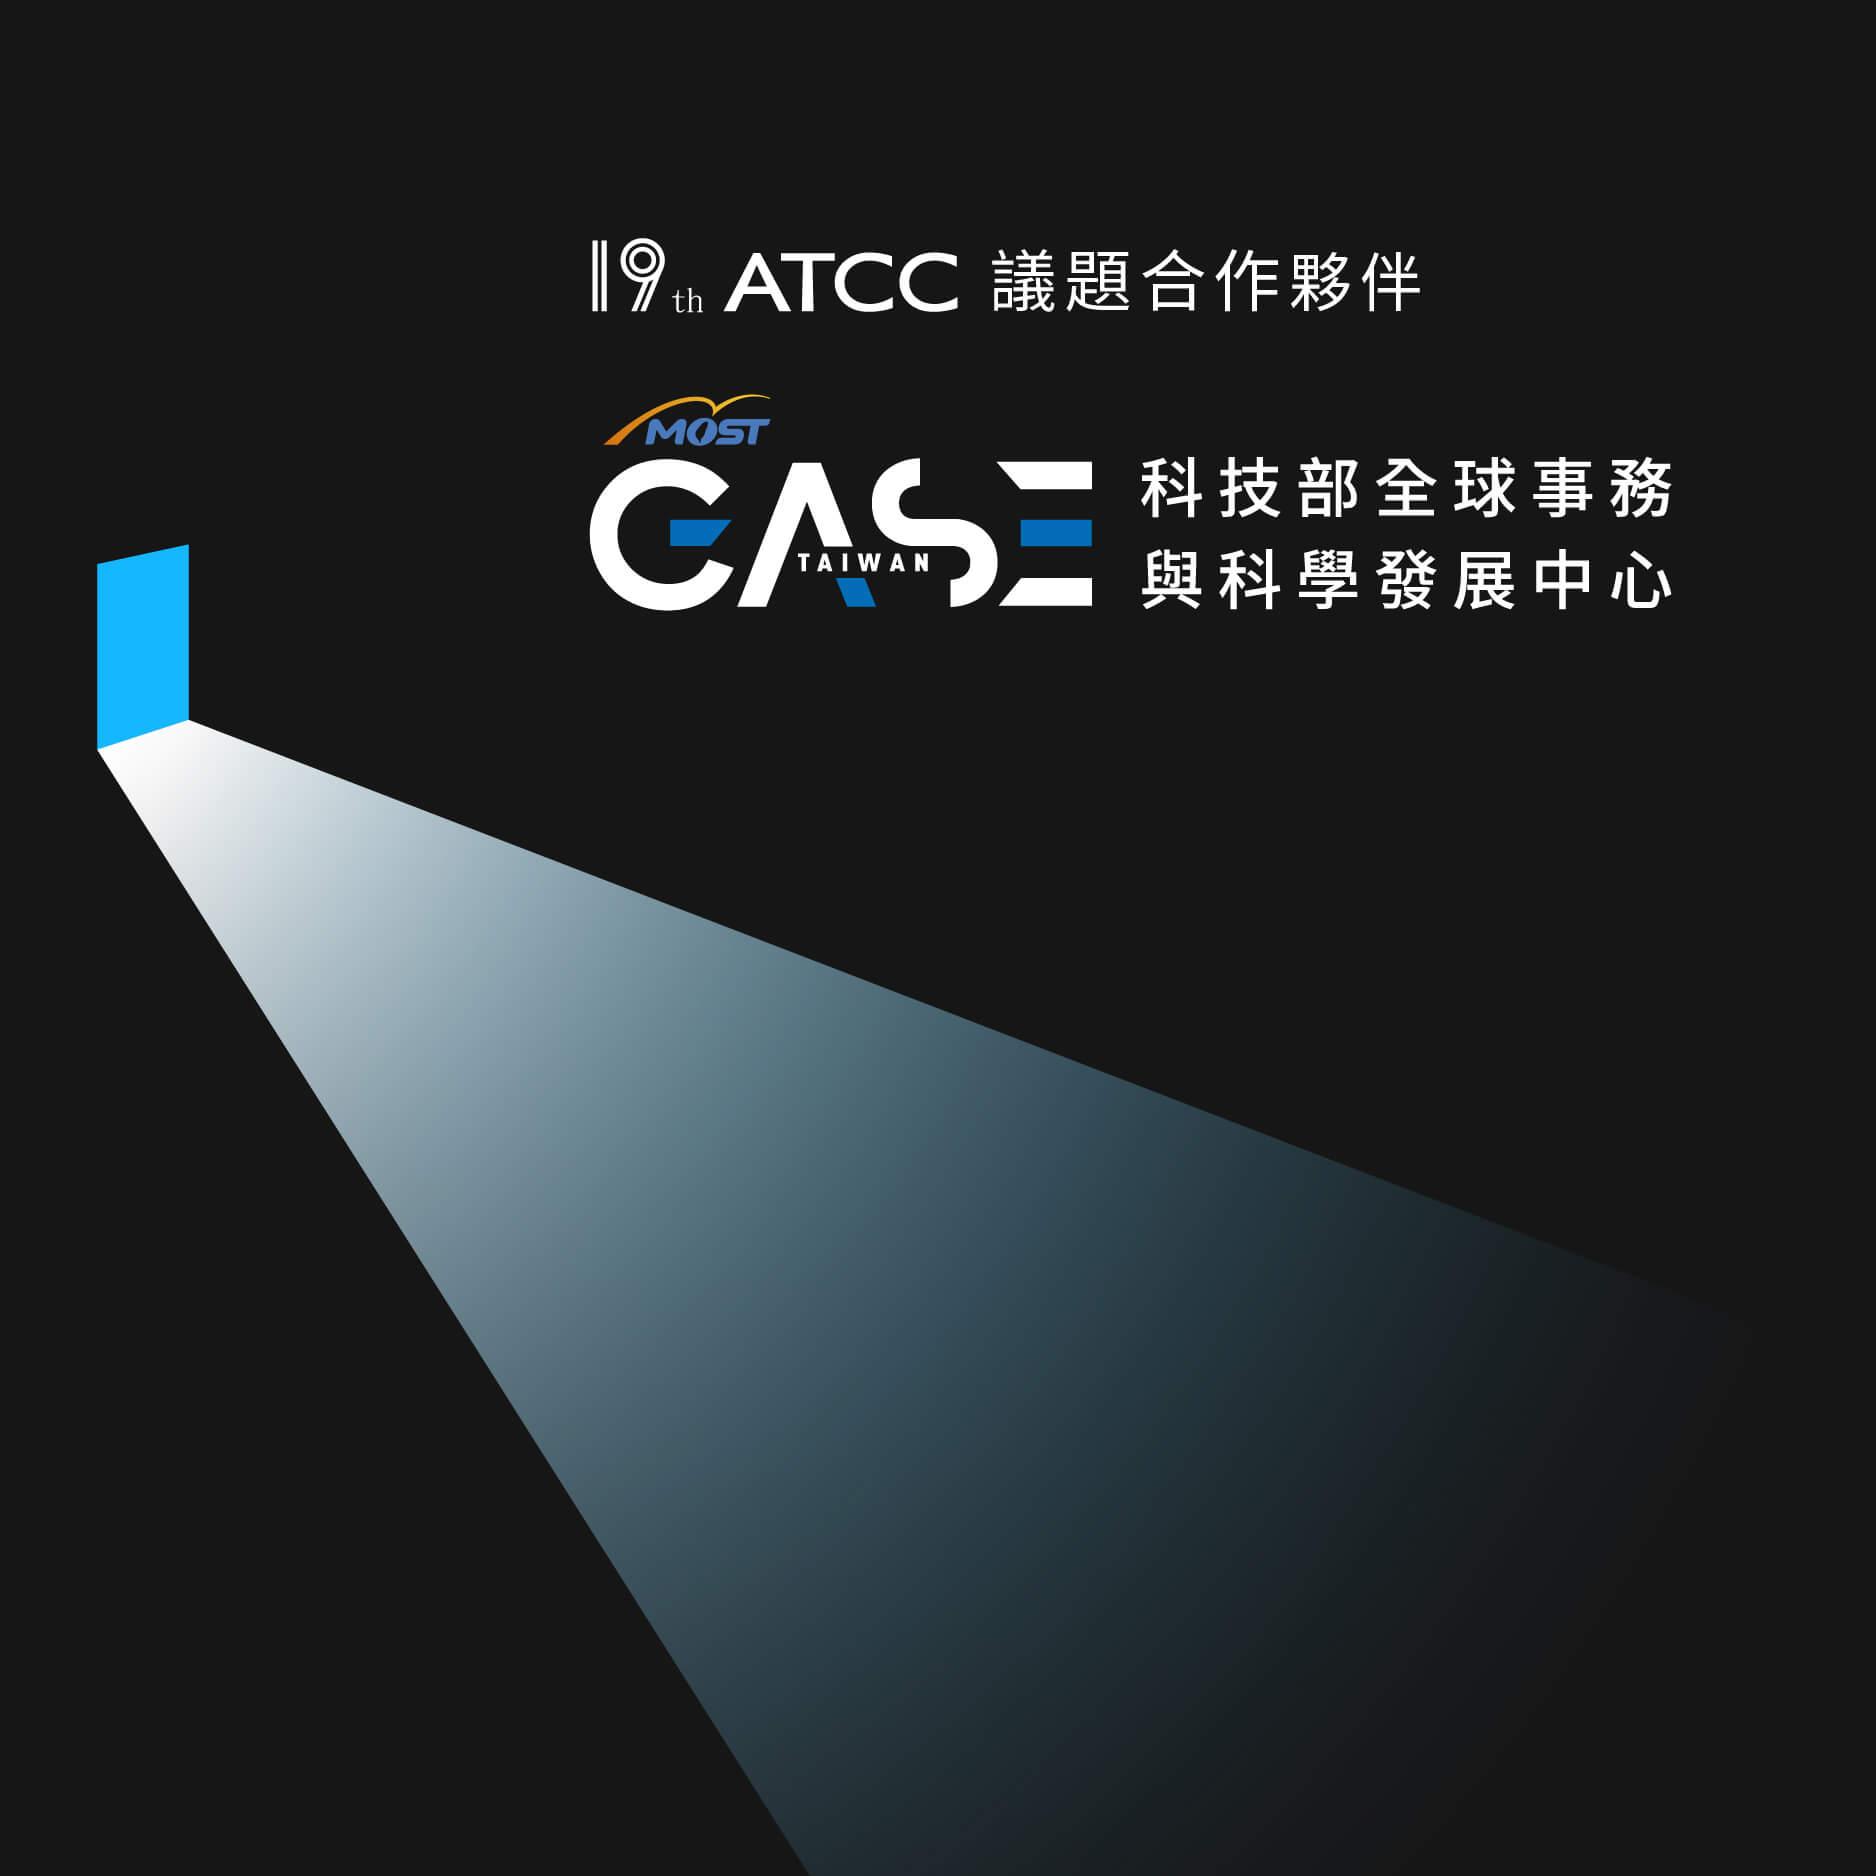 19th ATCC x 科技部全球事務與科學發展中心 MOST GASE